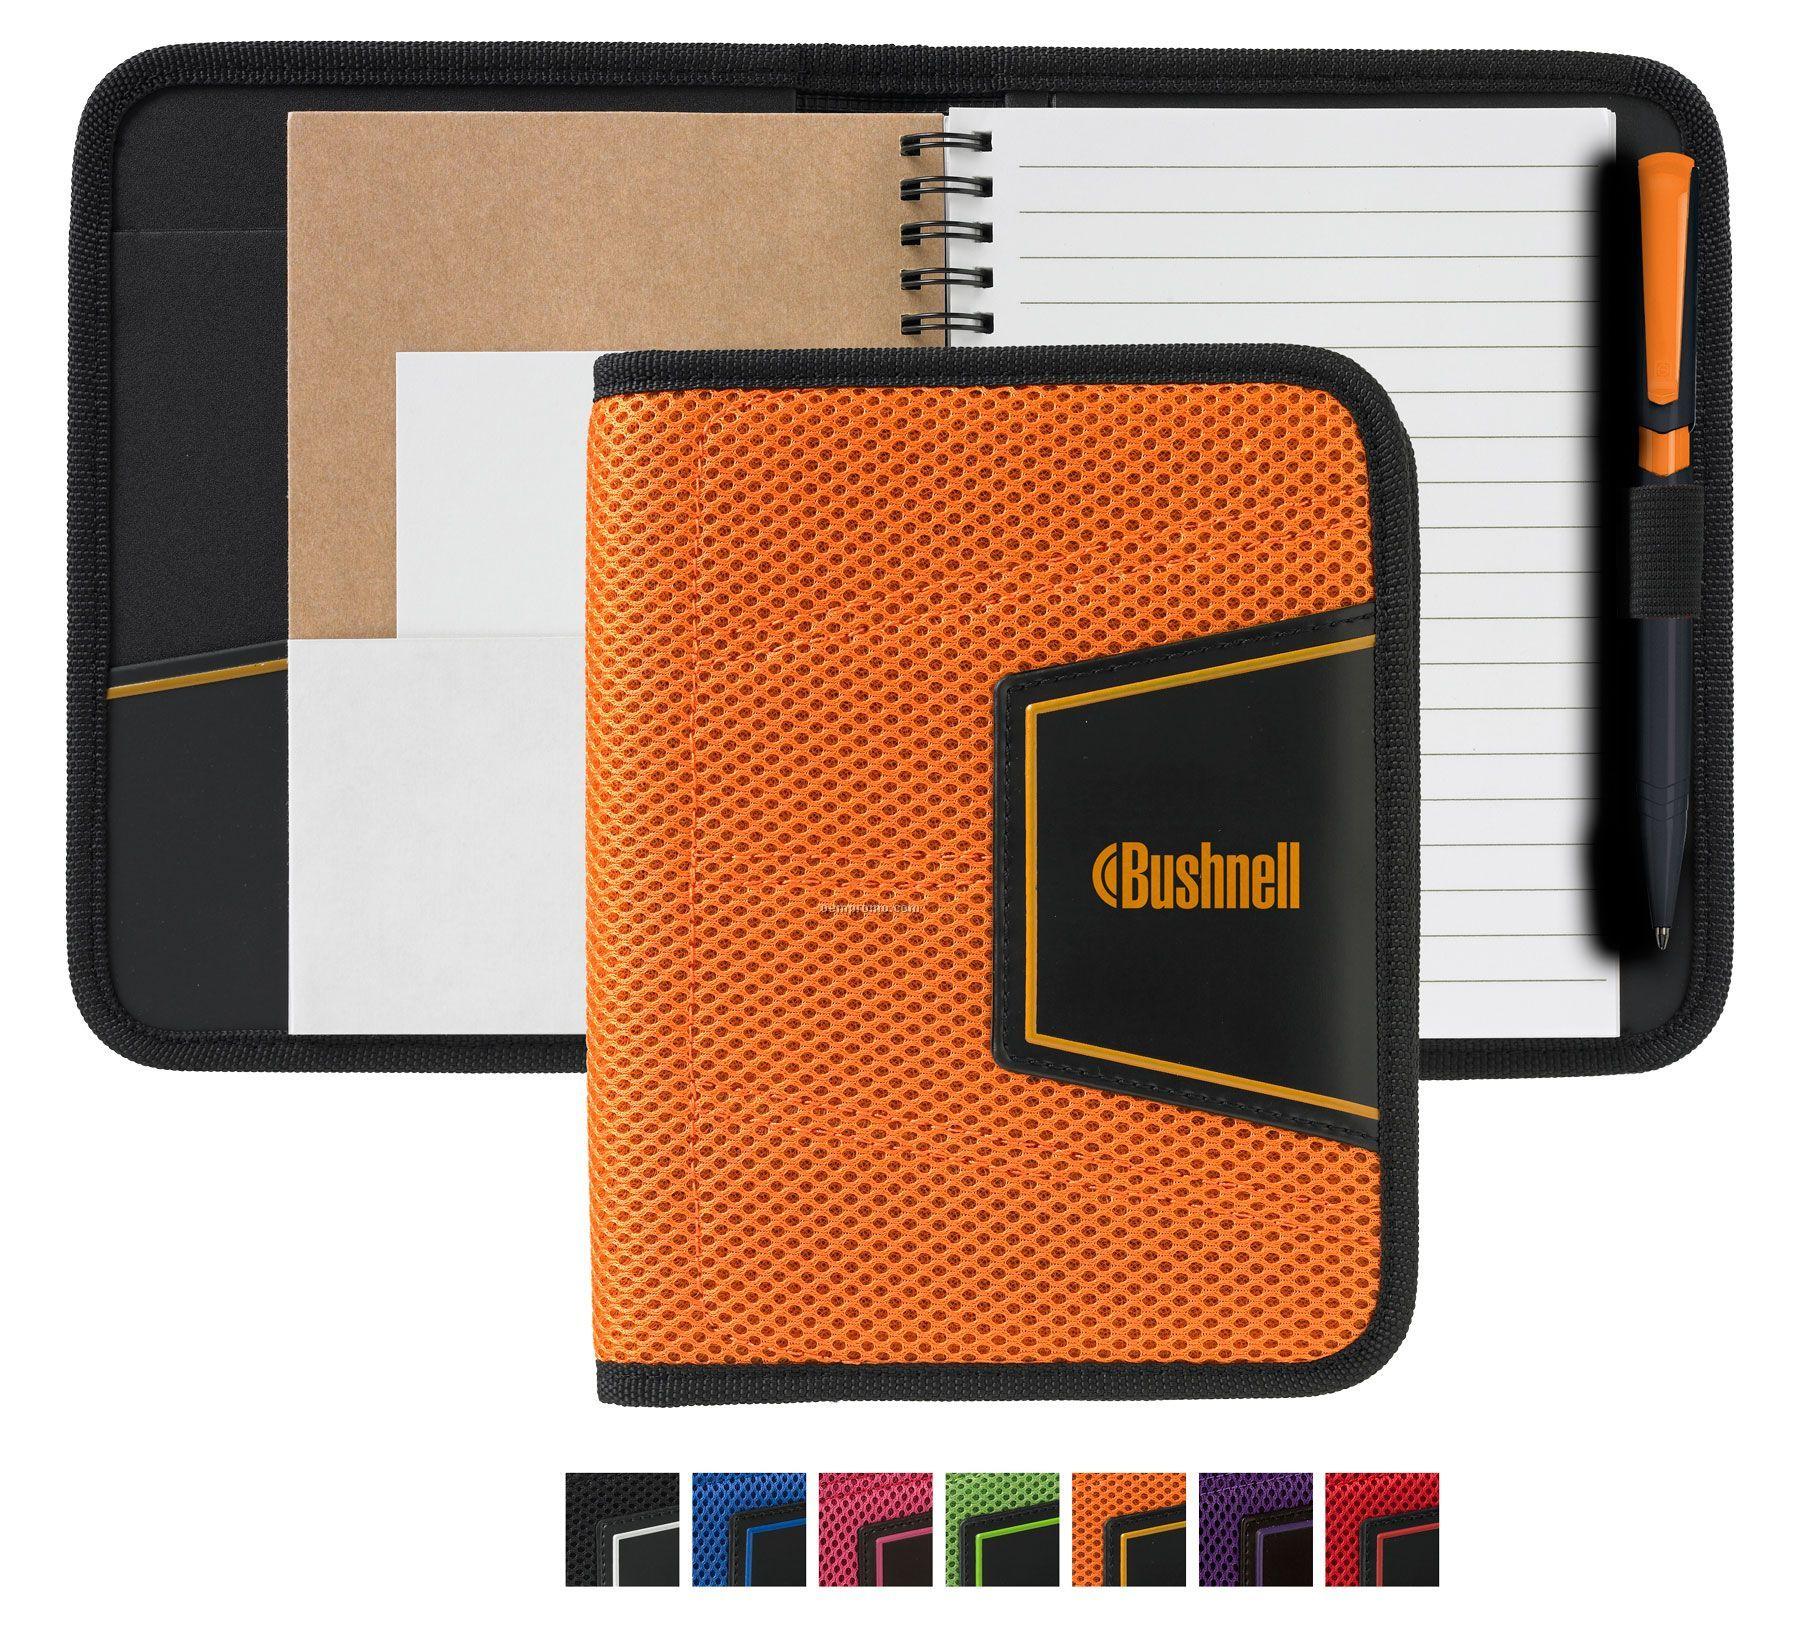 "Micro Mesh Compact 5"" X 7"" Journal"